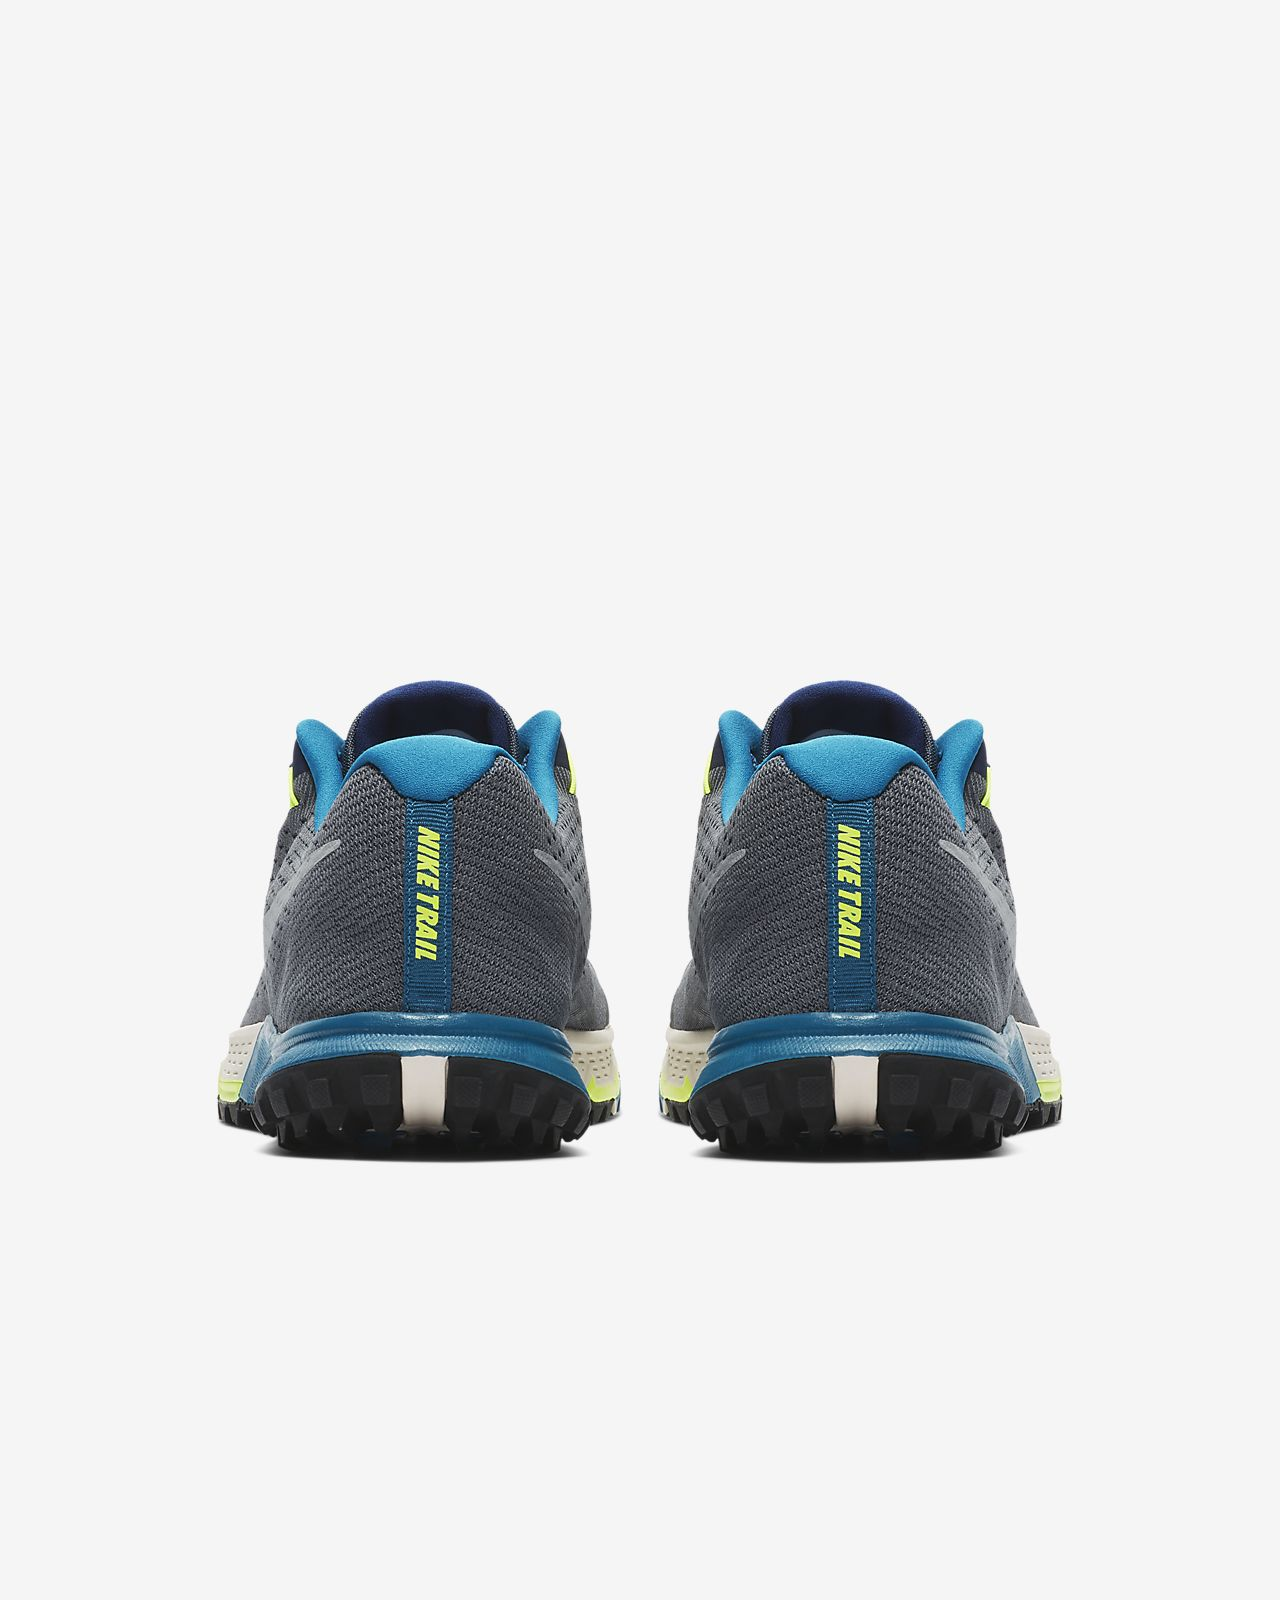 cdbbea62f80 Chaussure de running Nike Air Zoom Terra Kiger 4 pour Homme. Nike.com FR